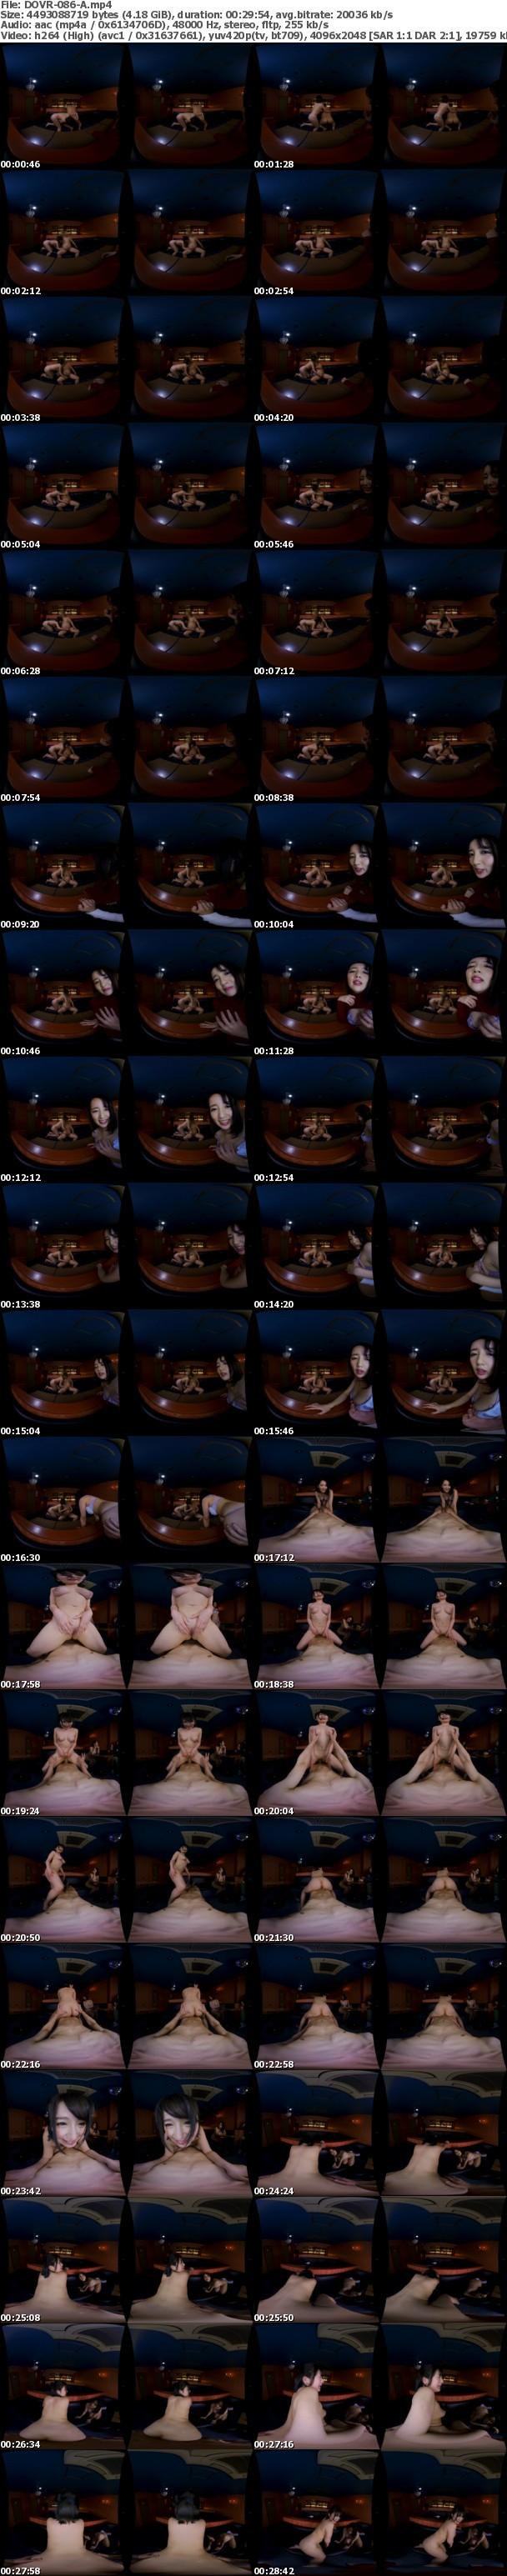 (VR) DOVR-086 あなたは新人AD!撮影終了後、女優さんに飲みに誘われたらそりゃ行くでしょ!しかもそれがハプニングバーでもうヤレる気しかしない!!美咲かんな・優梨まいな